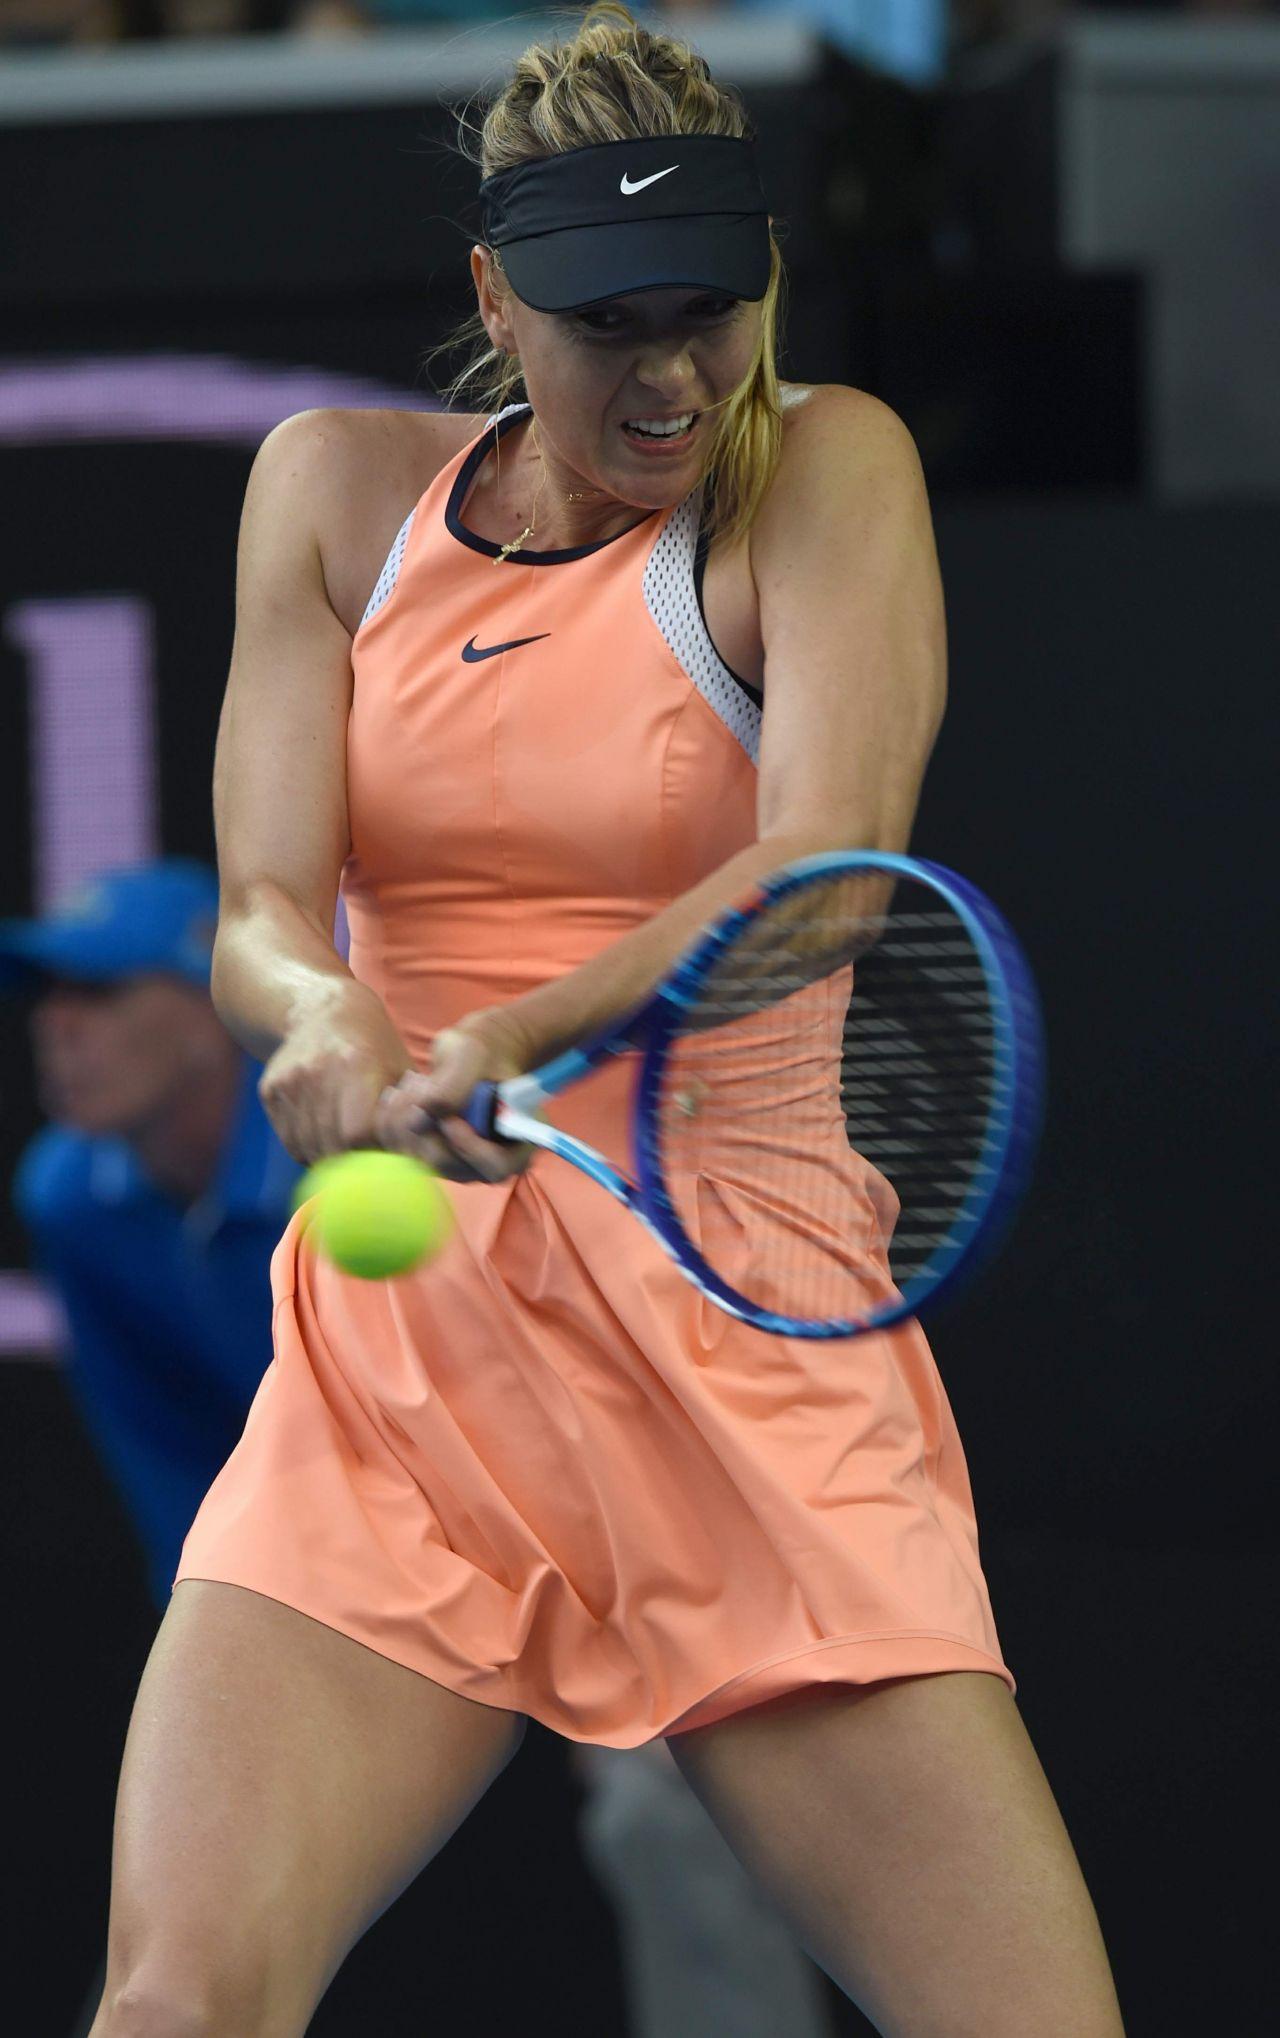 Maria Sharapova 2016 Australian Open In Melbourne 1 18 2016